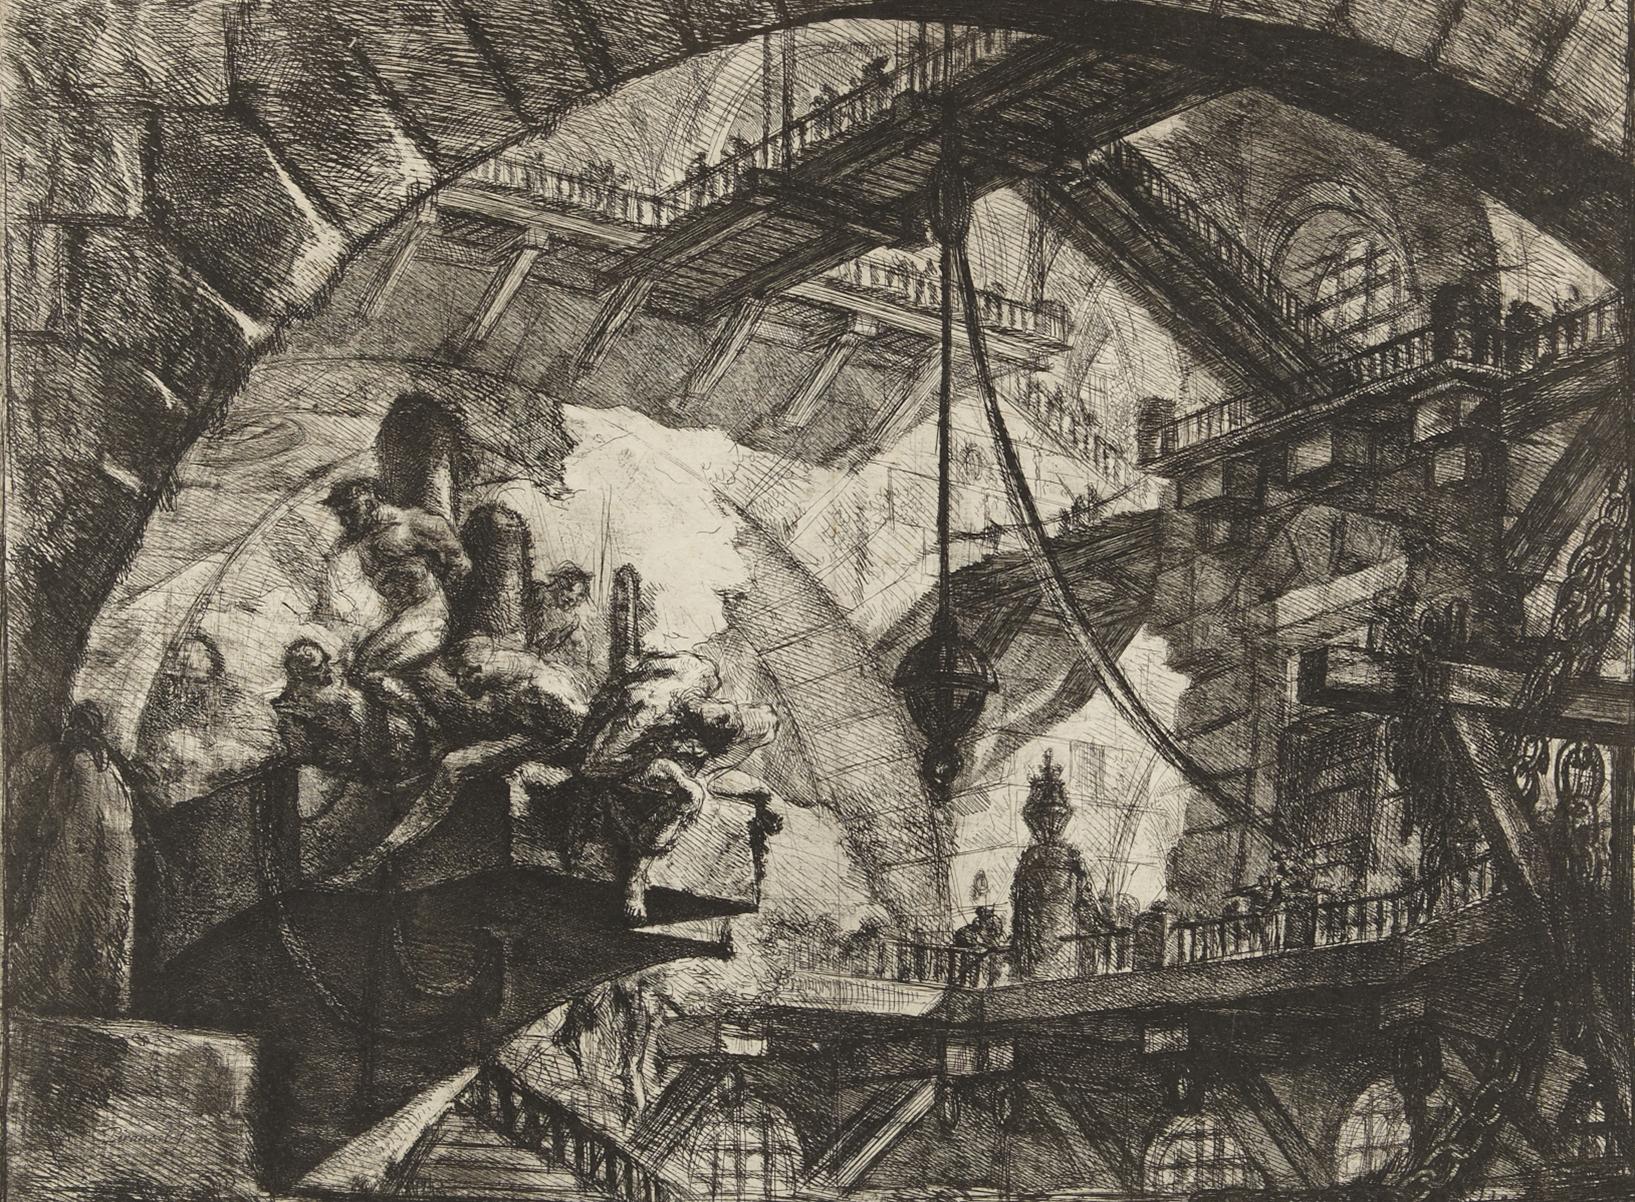 Piranesi-Carceri-X Prisoners_on_a_Projecting_Platform-1761